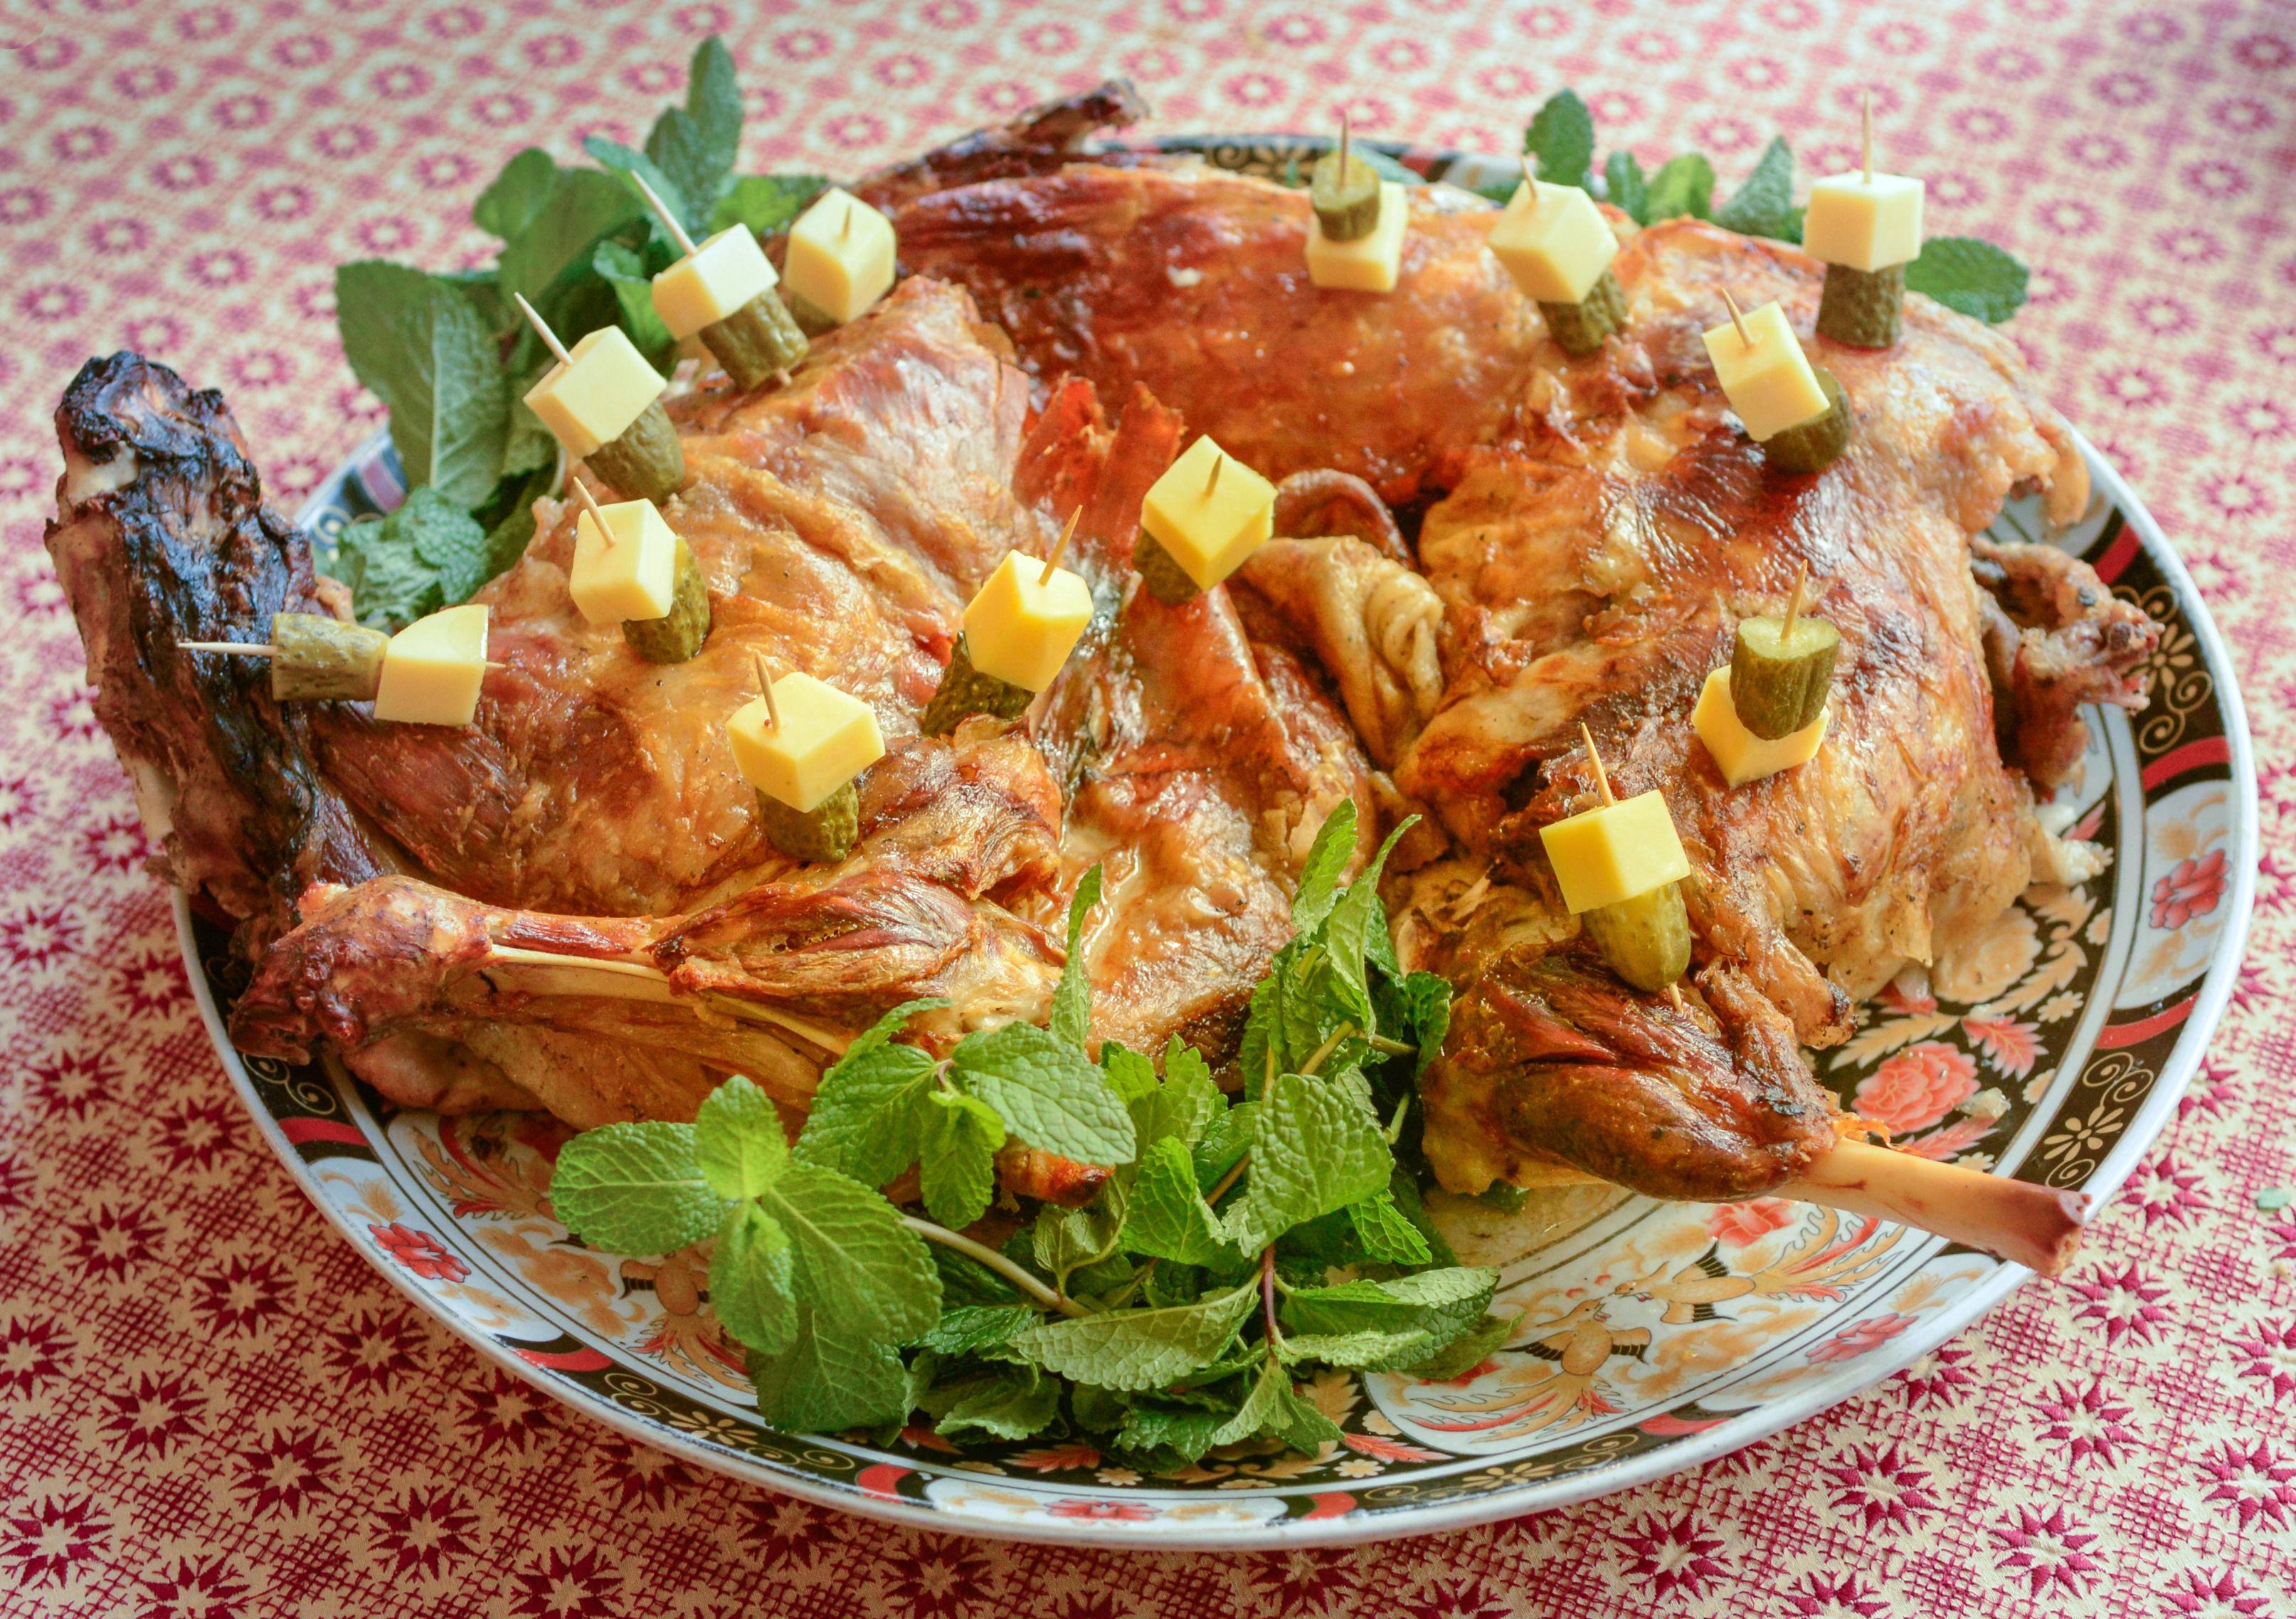 Moroccan roasted lamb